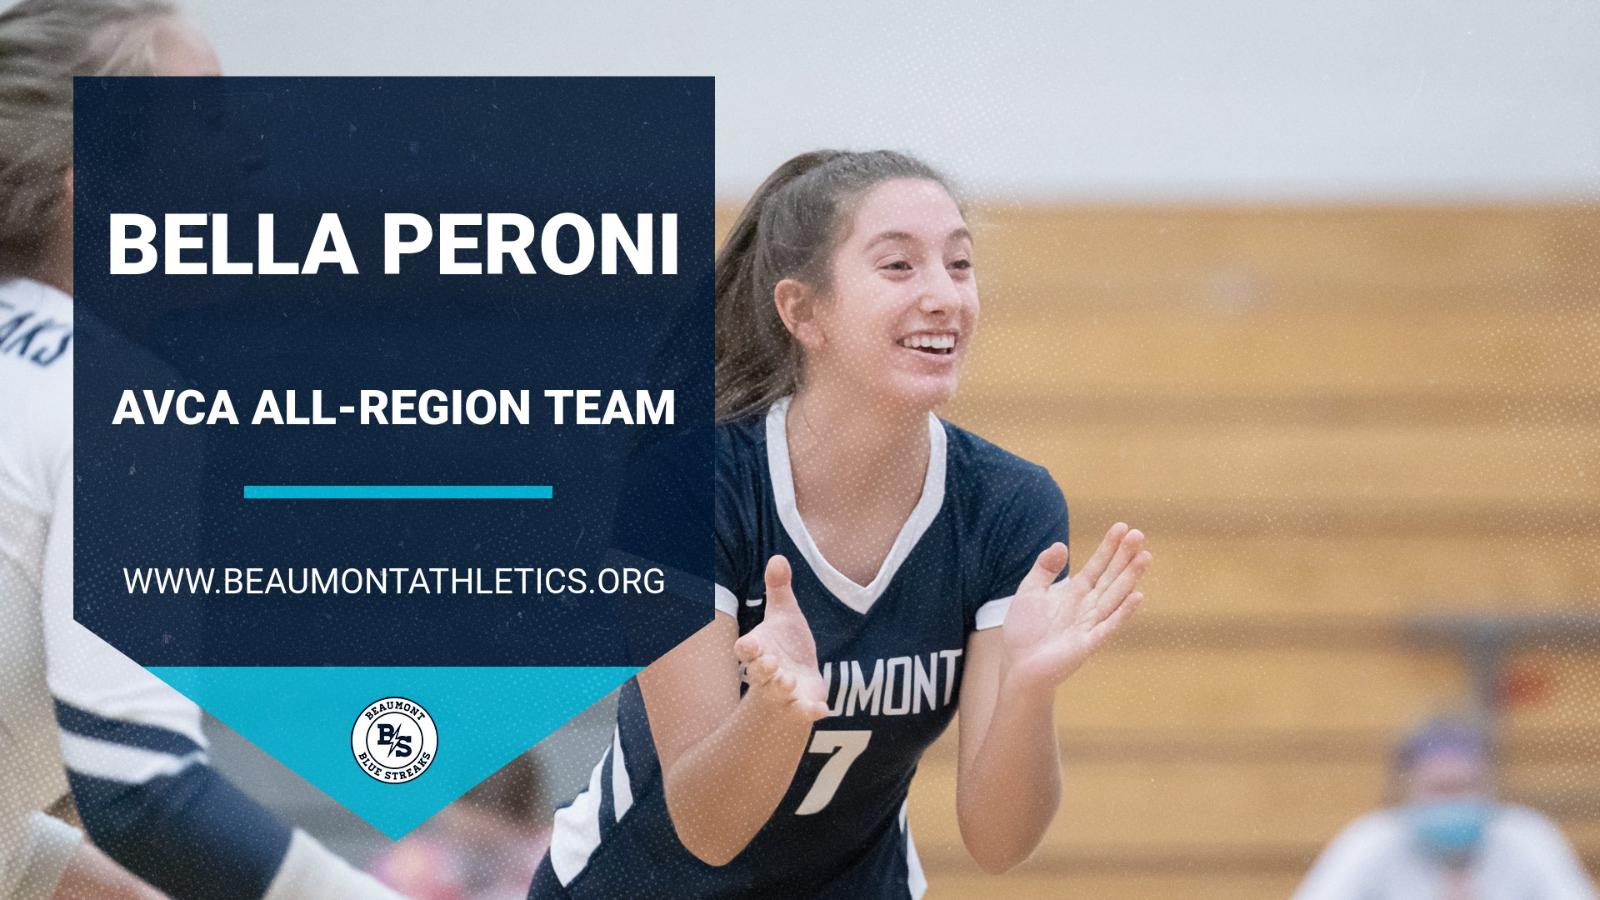 Bella Peroni Named to AVCA All-Region Team